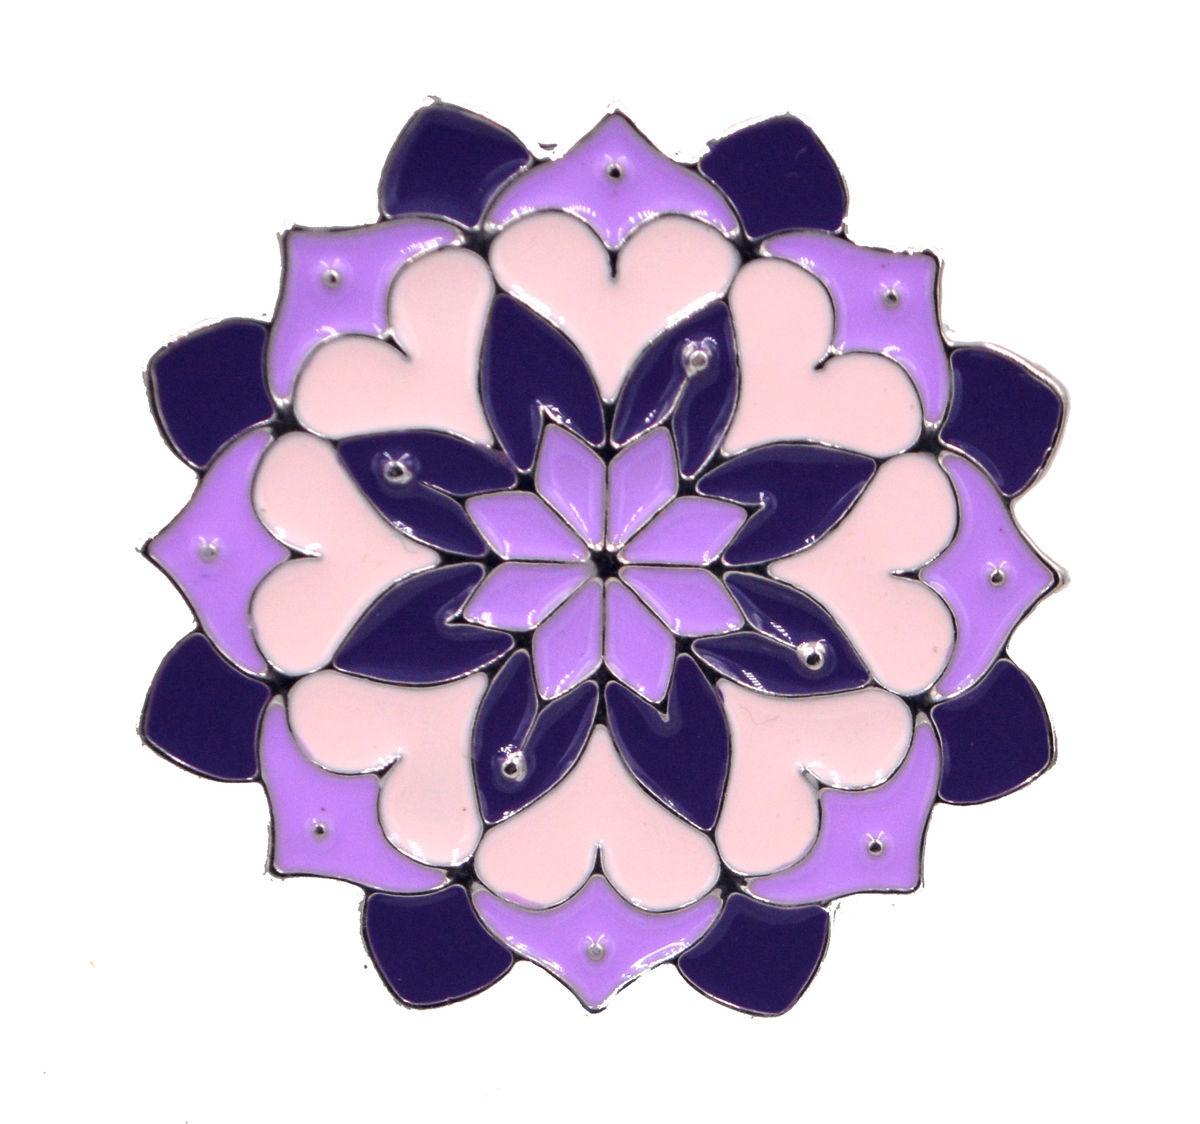 Lotus Flower Hand Painted Enamel Pin Lilac Purple In Organza Bag